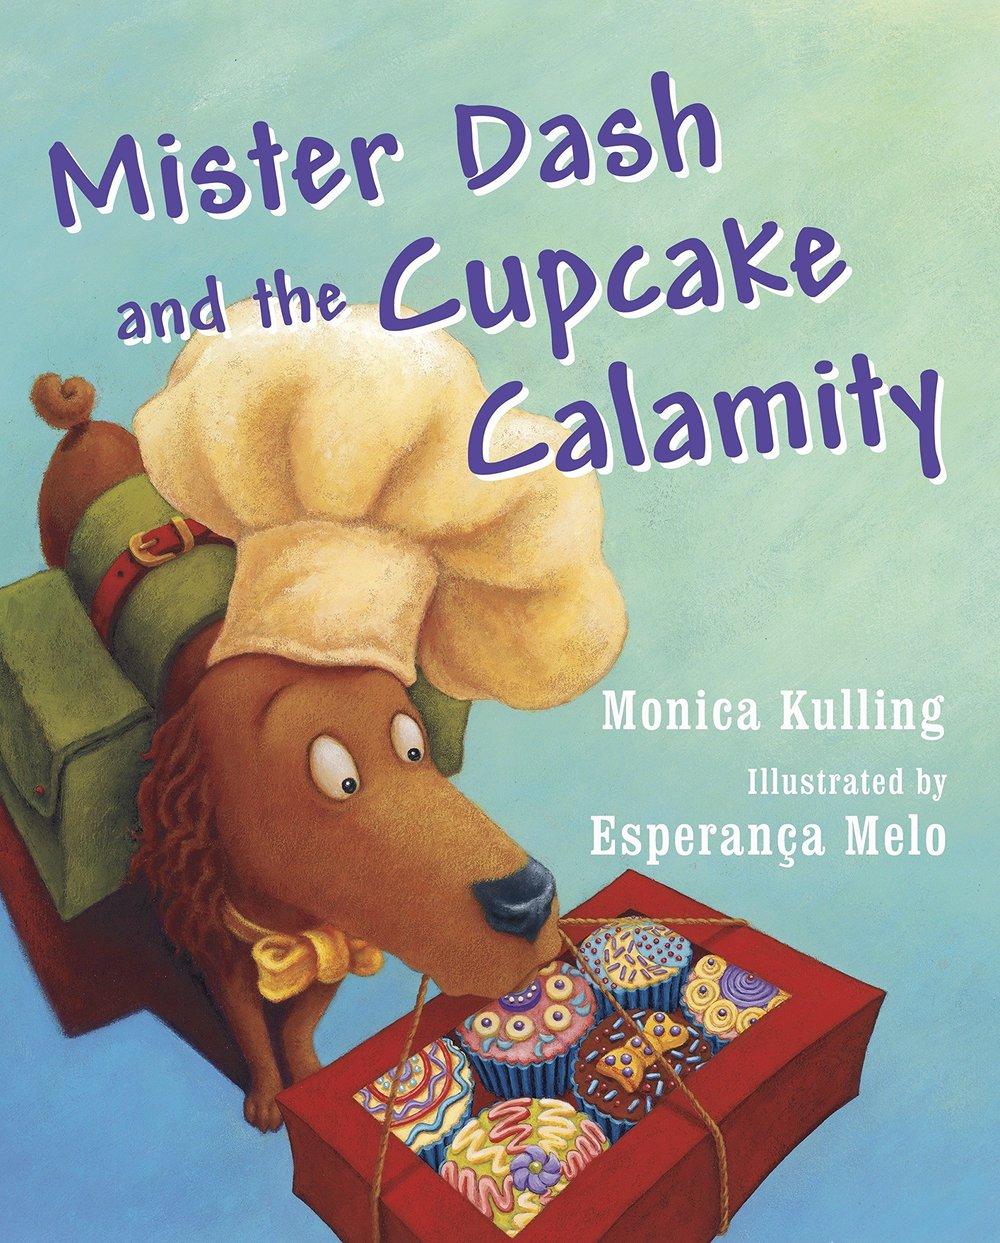 mister-dash-and-the-cupcake-calamity.jpg